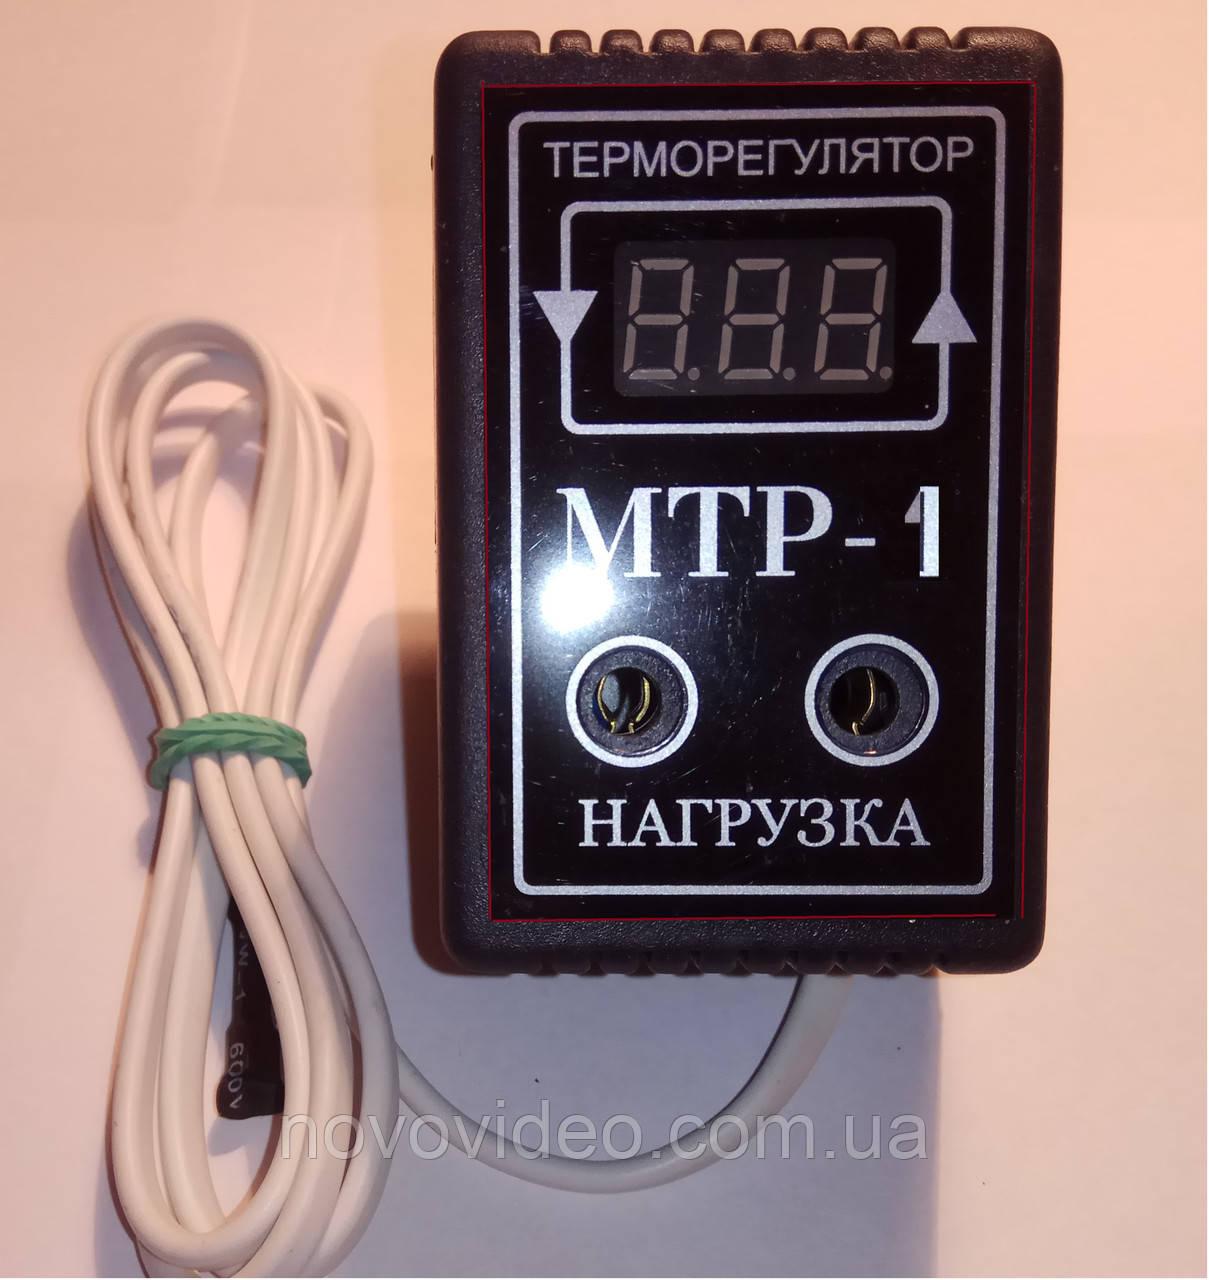 Терморегулятор на один предел температуры МТР-1 на 10А